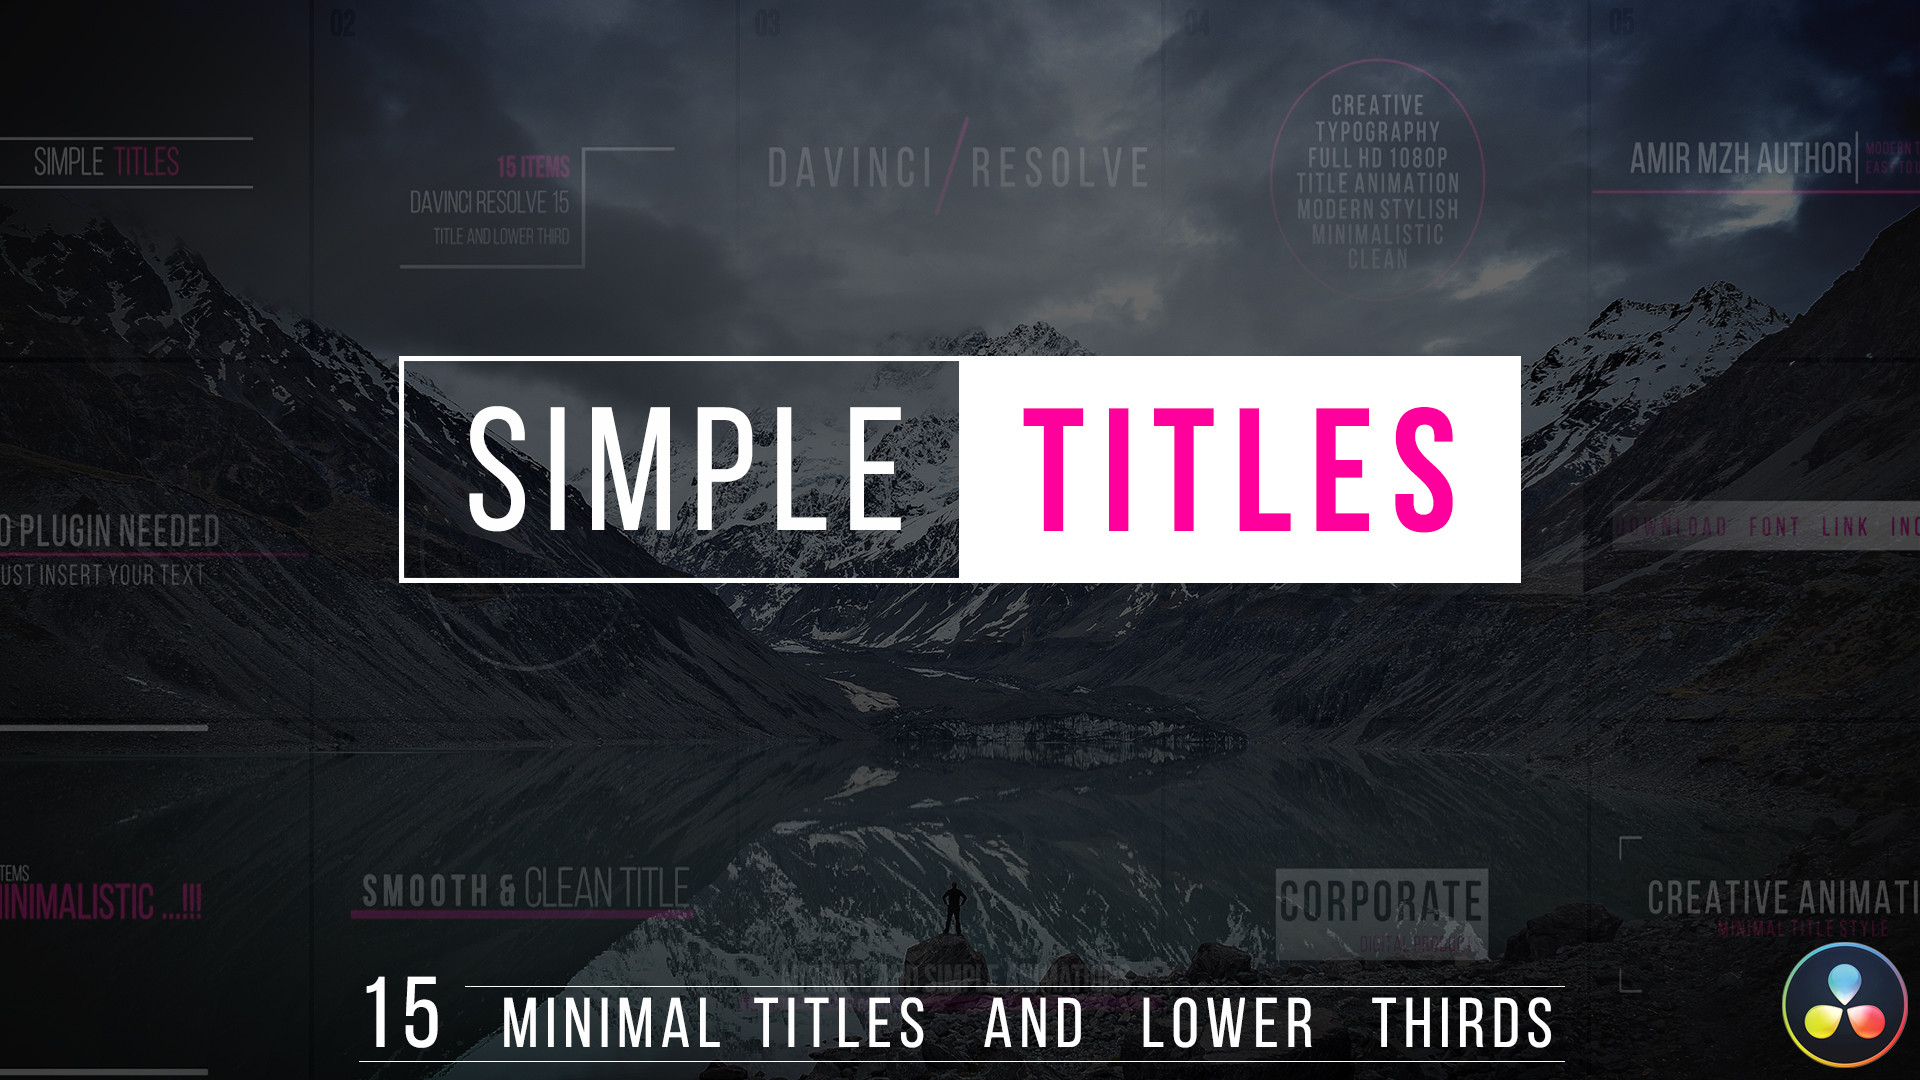 Simple Titles Davinci Resolve Templates Motion Array